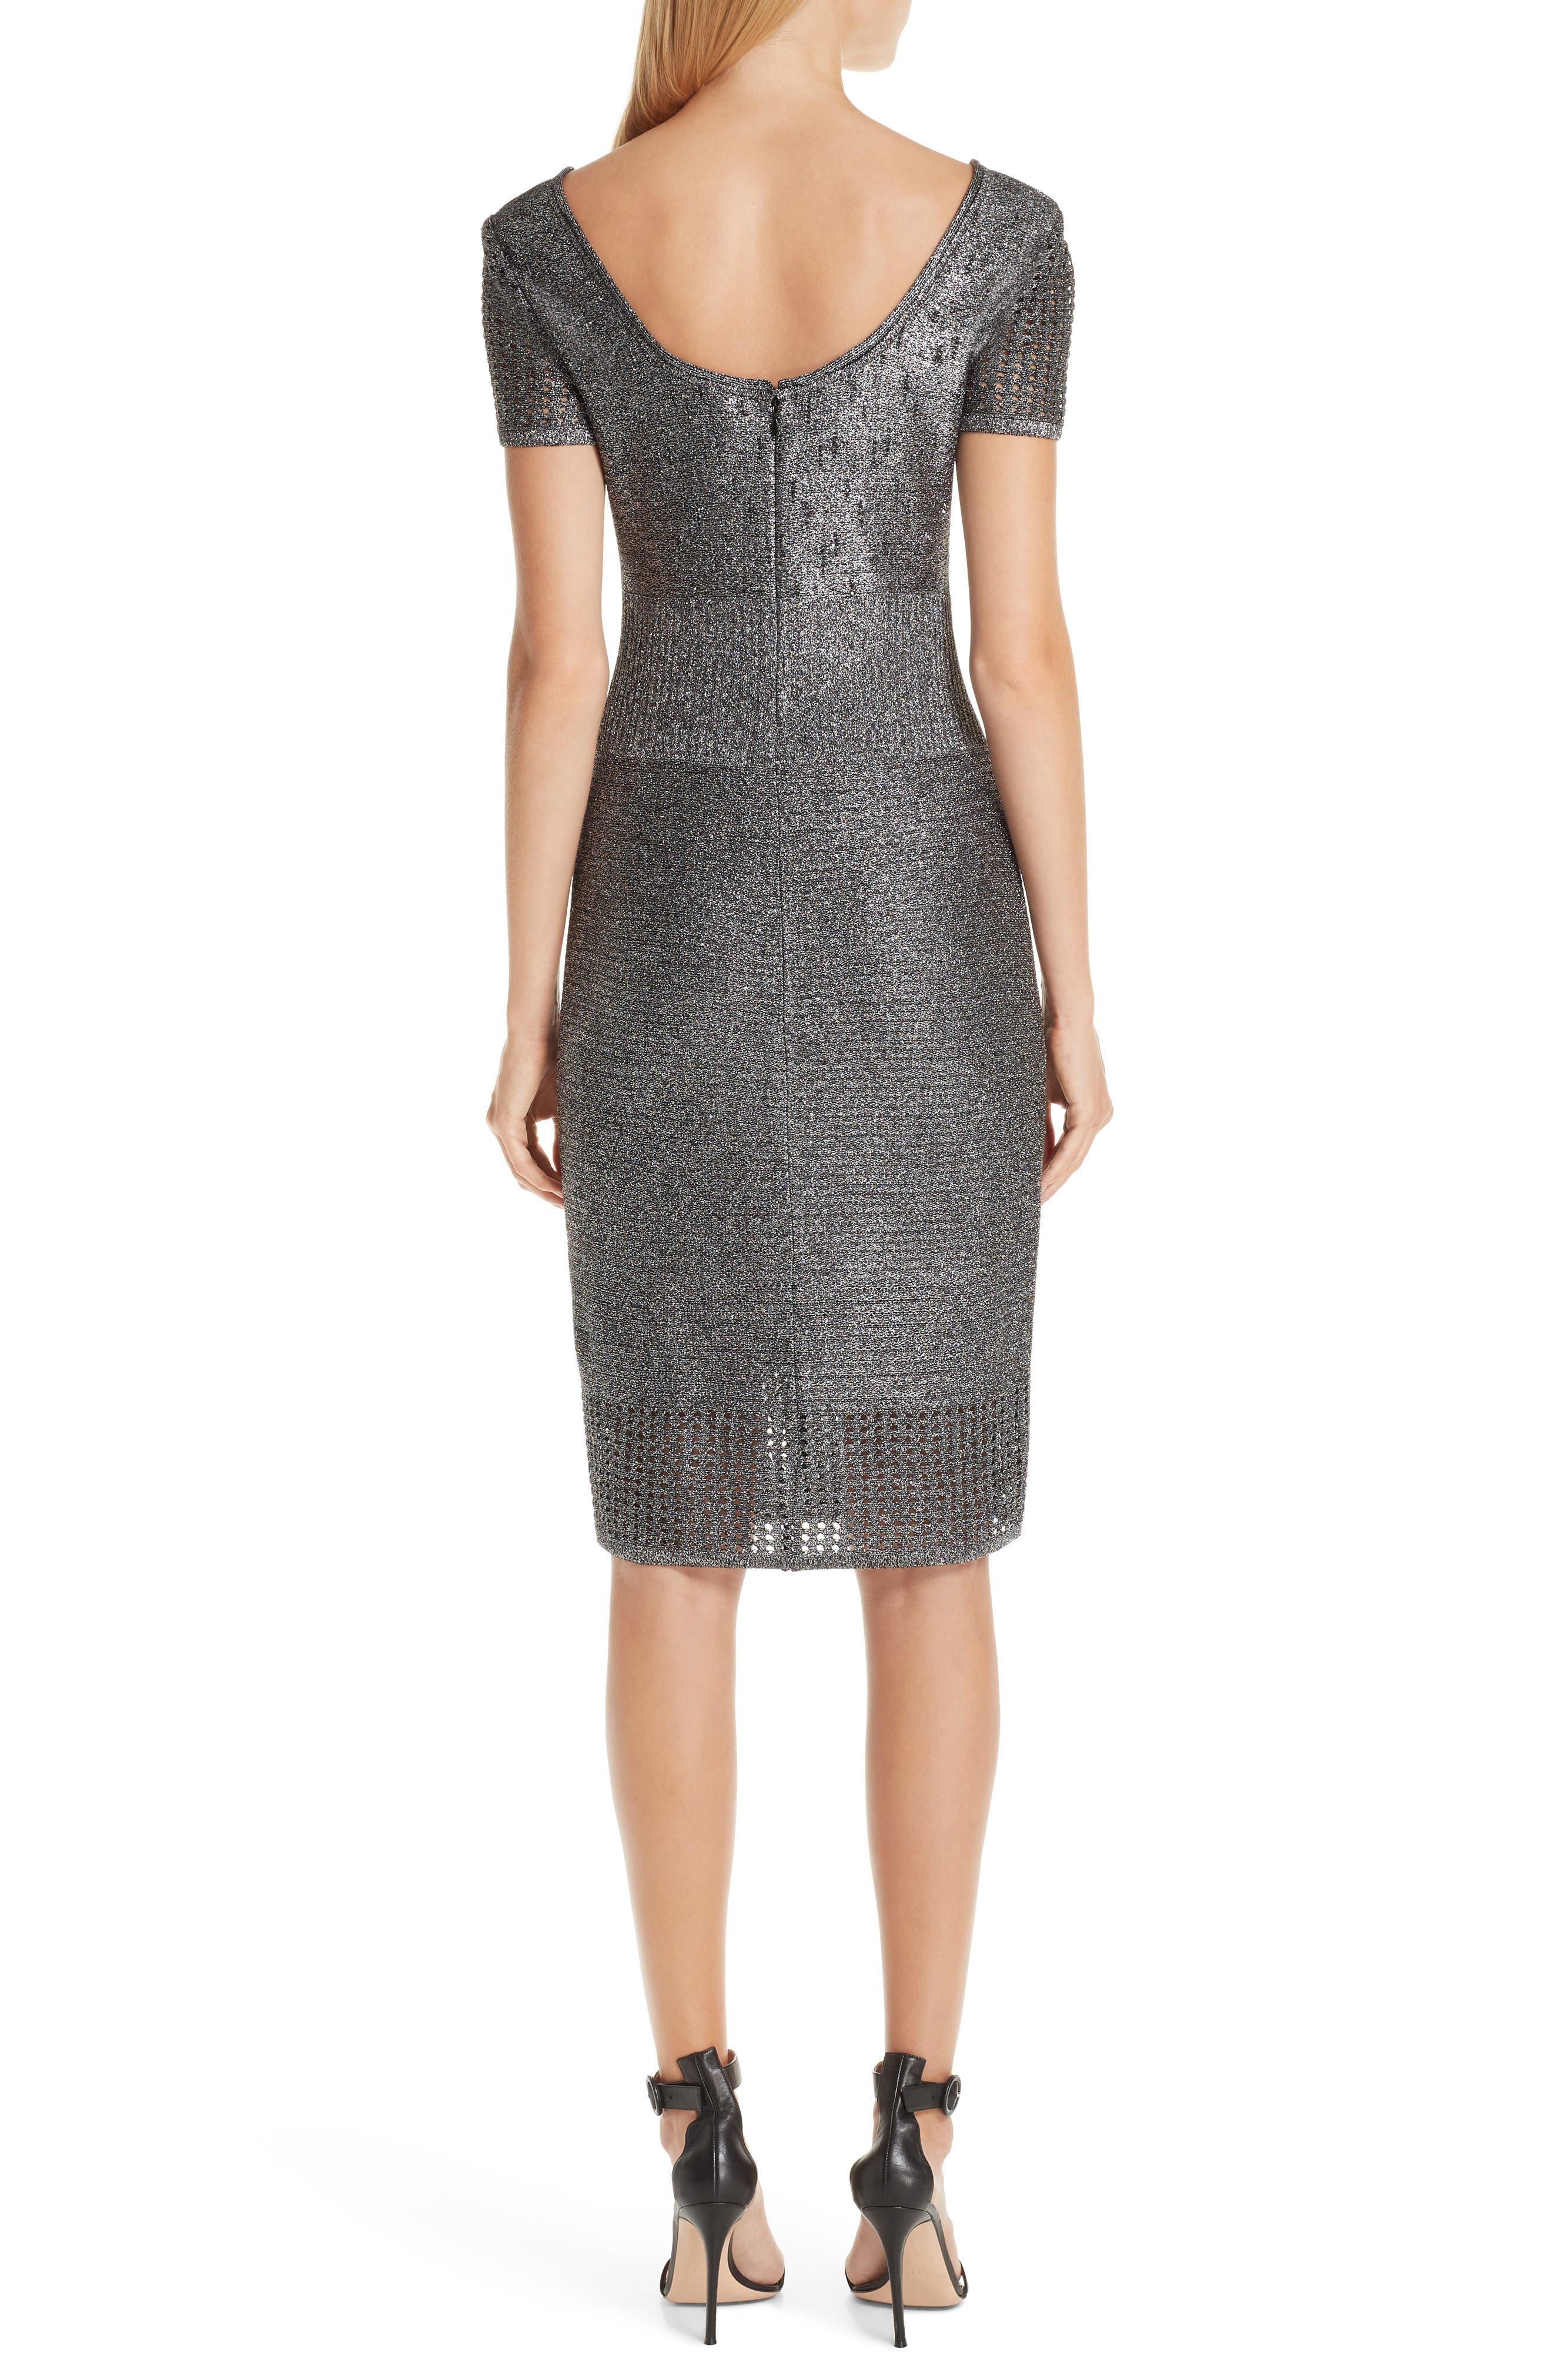 ST. JOHN COLLECTION, Metallic Plaited Mixed Knit Dress, Alternate thumbnail 2, color, GUNMETAL/ CAVIAR